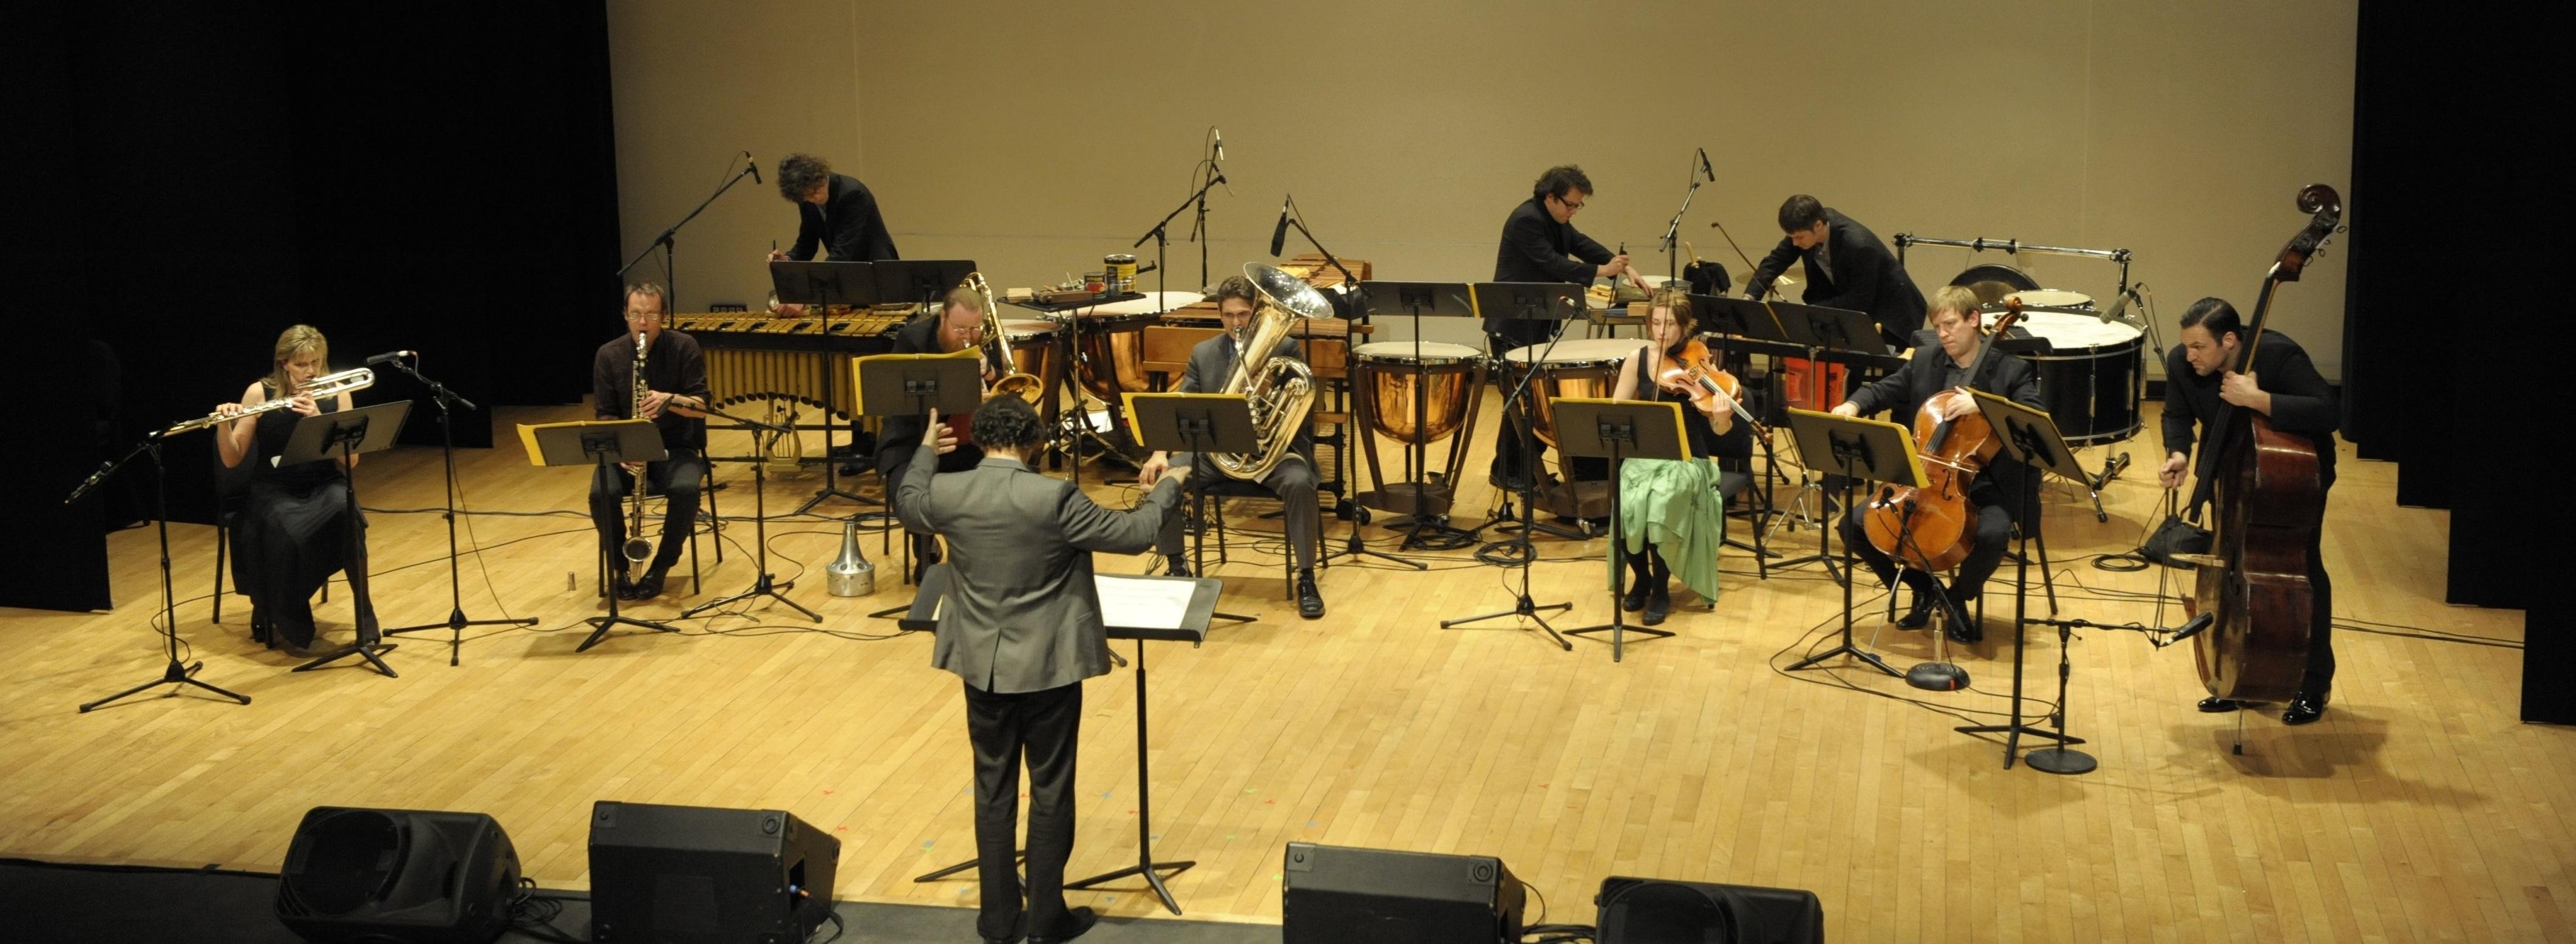 Amateur chamber music festival northeast